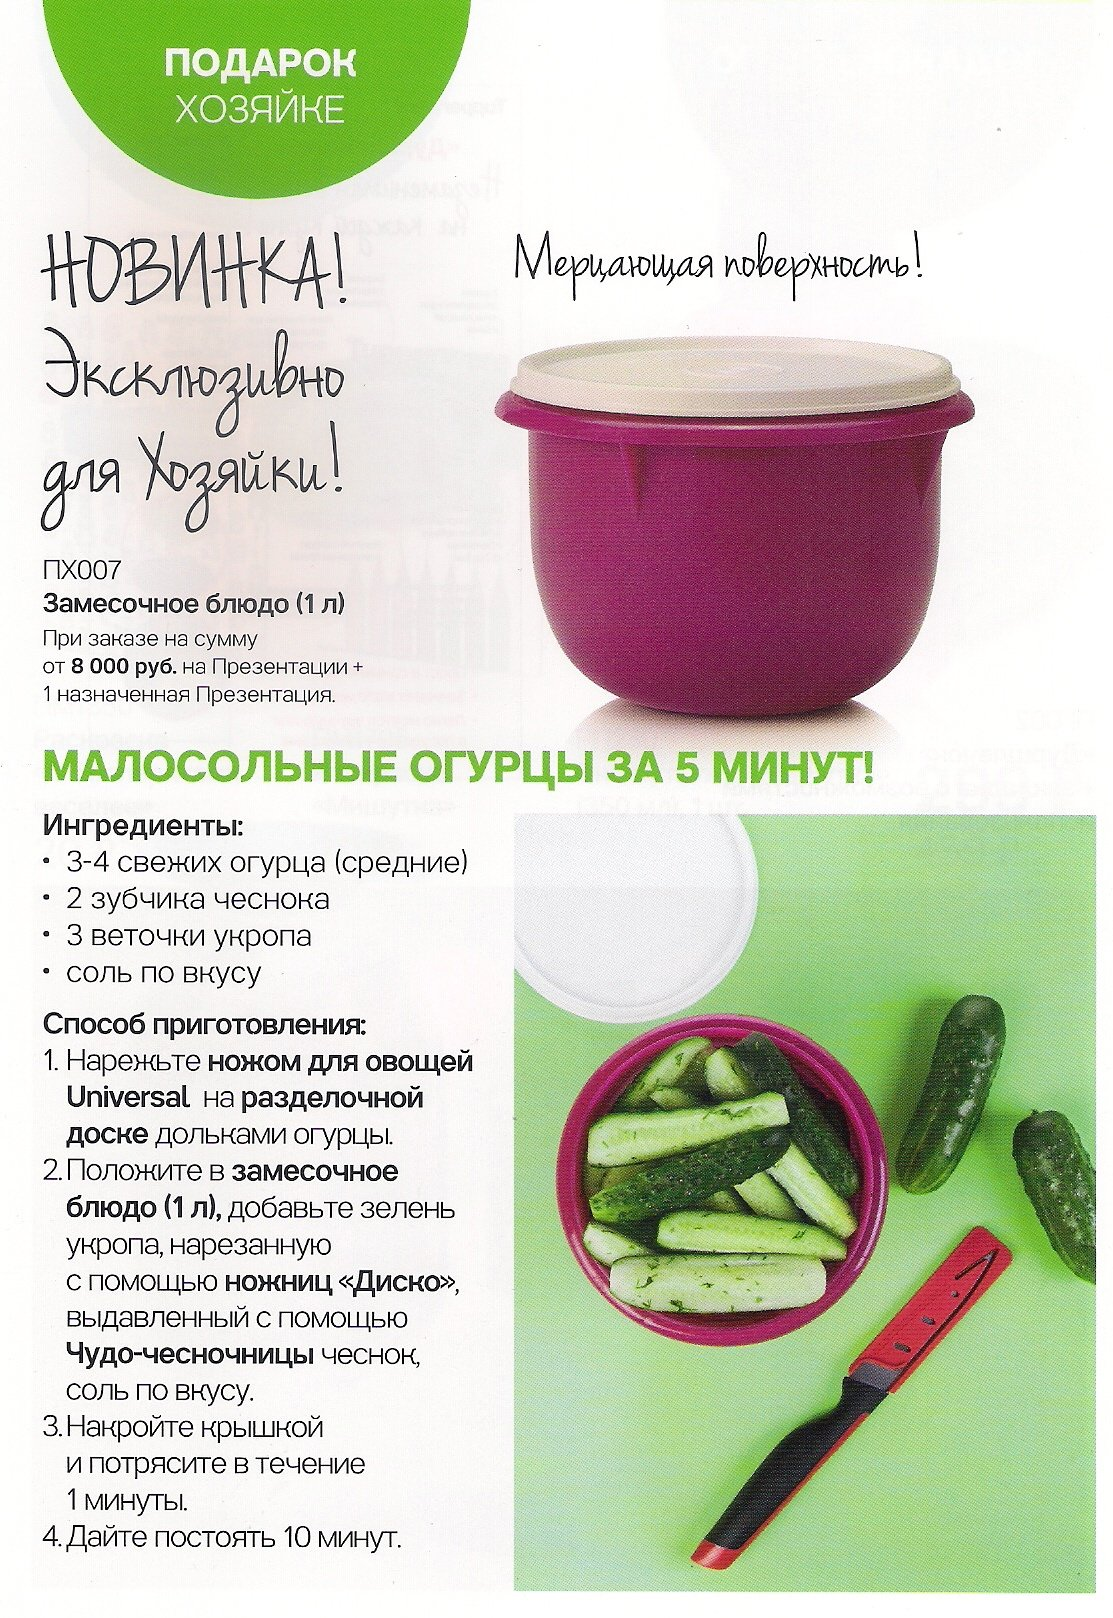 http://tupperware-online.ru/images/upload/3a.jpg